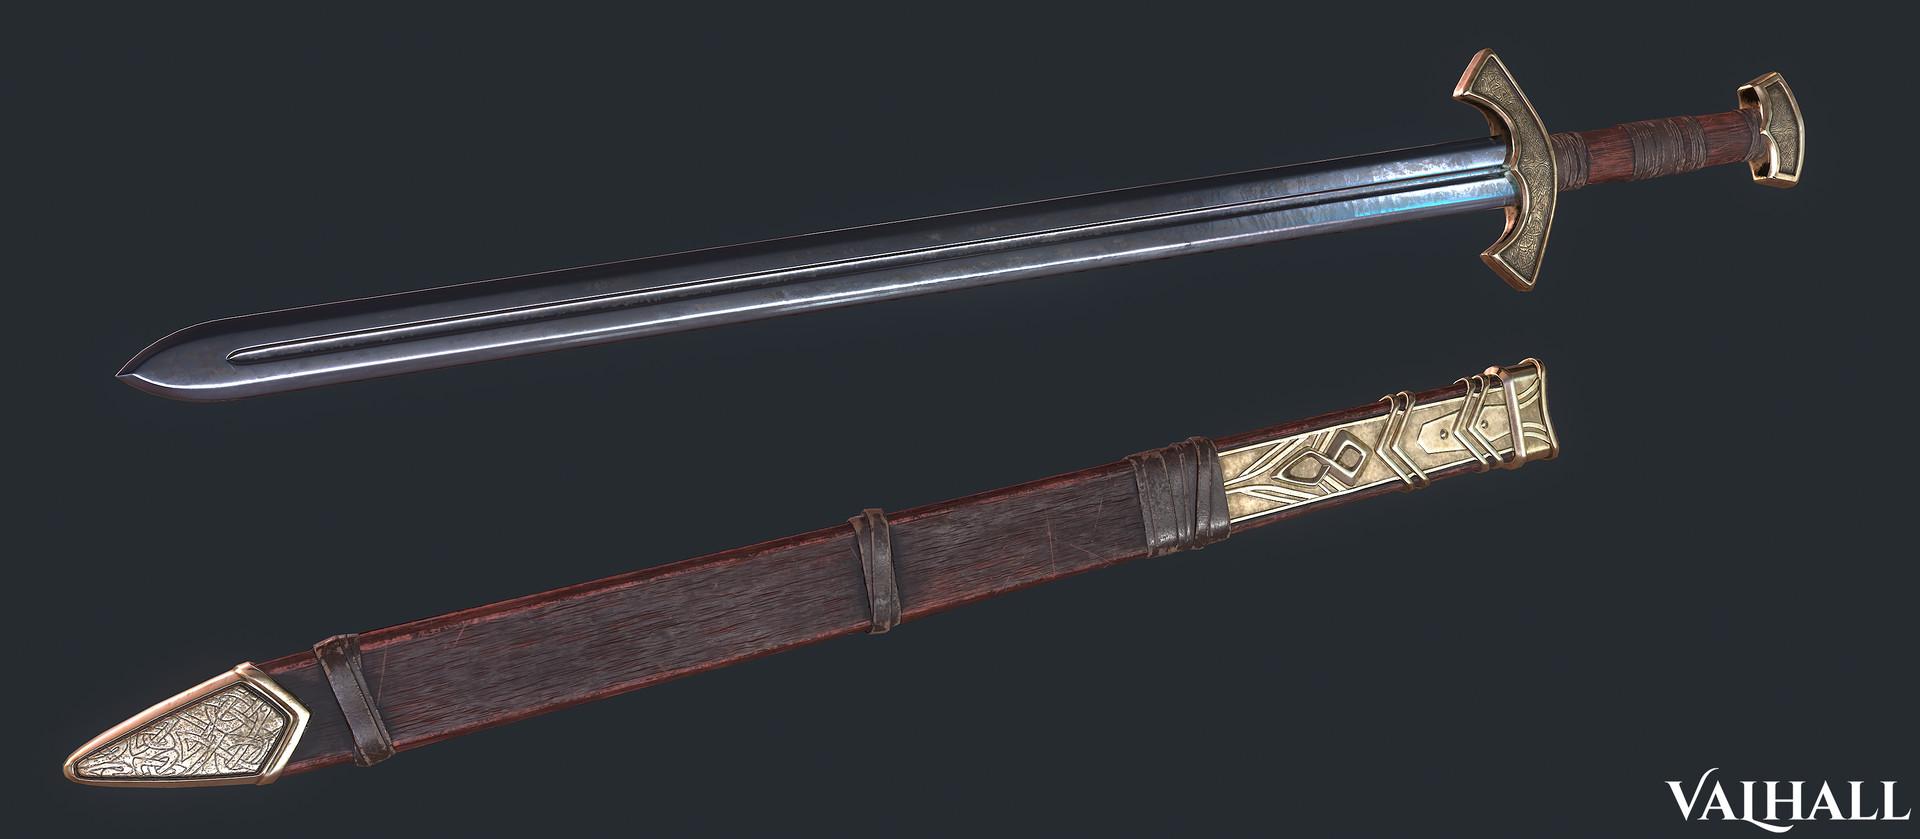 Roger perez sword01 side